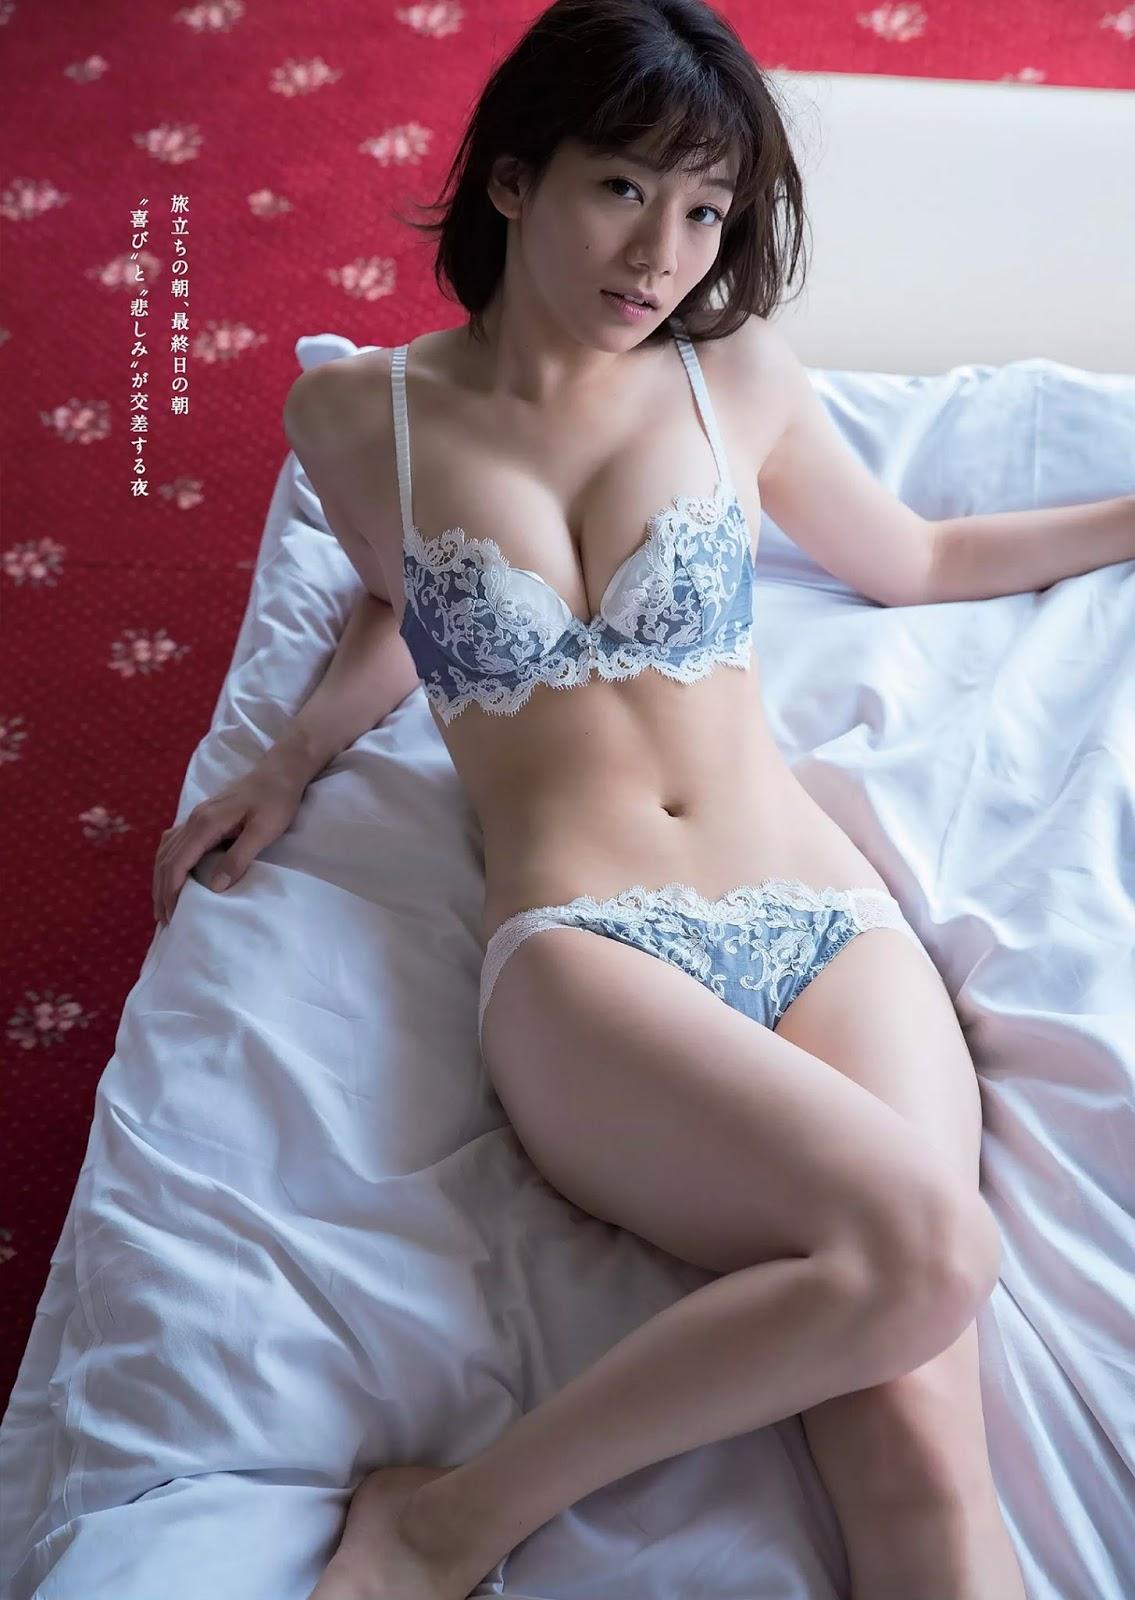 Miki Sato 佐藤美希, Weekly Playboy 2017 No.45 (週刊プレイボーイ 2017年45号)